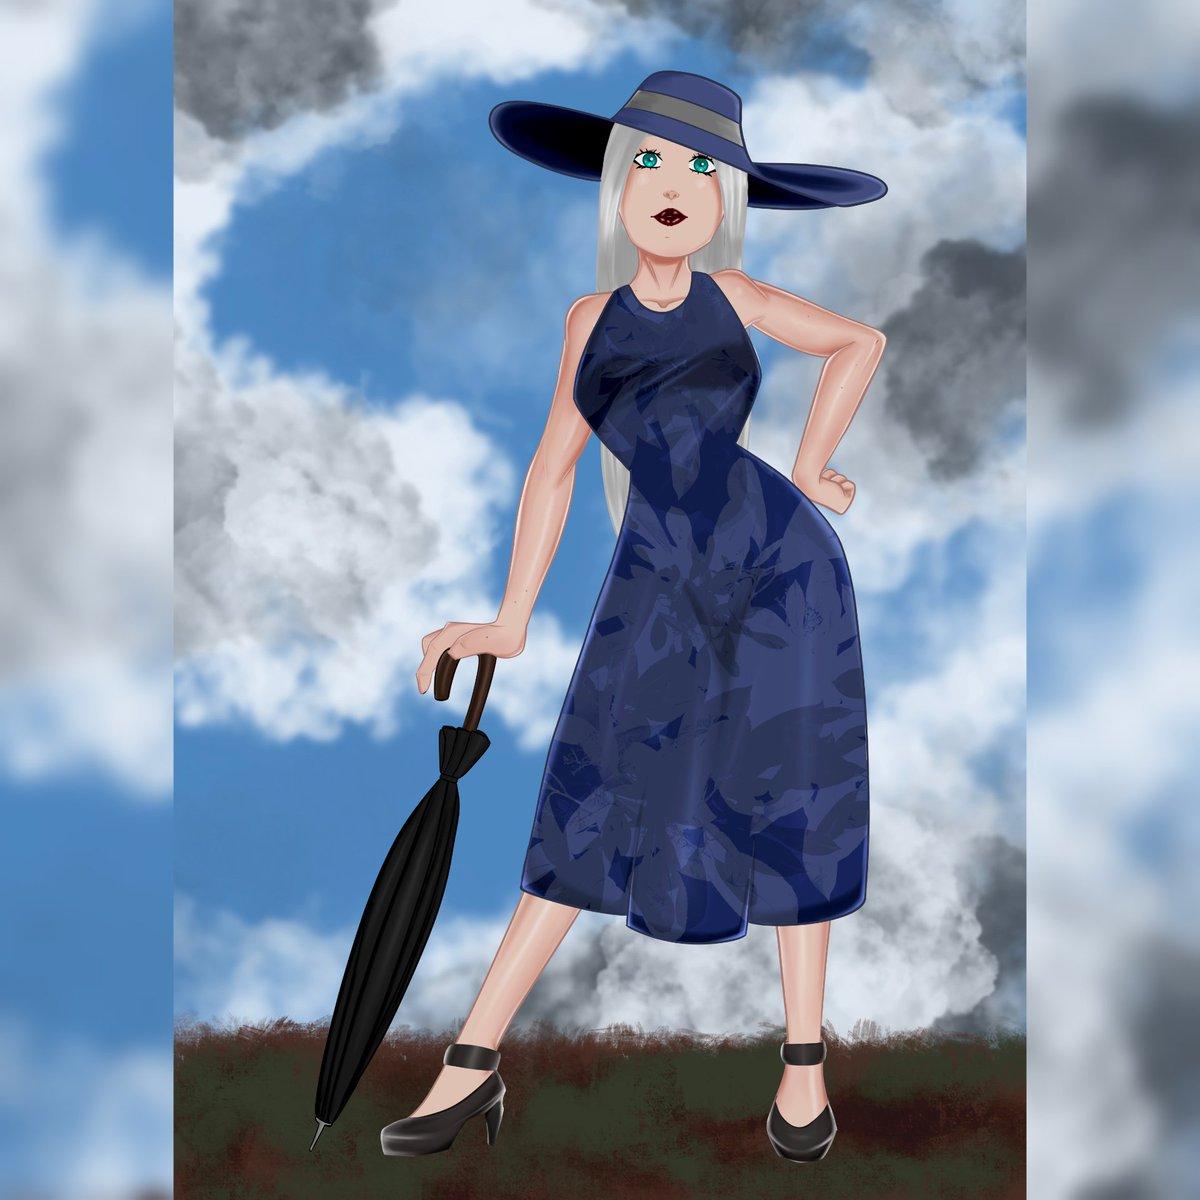 #draw #dibujo #art #ipadart #procreate #process #digitalart #artoninstagram #artistoninstagram #illustration #digitalpainting #ipadproart #boudoir #pinup #sexy #girl #beautiful #hat #dress #bodysuit #tattoo #tattoogirl #umbrellapic.twitter.com/2wQUyjM6qP